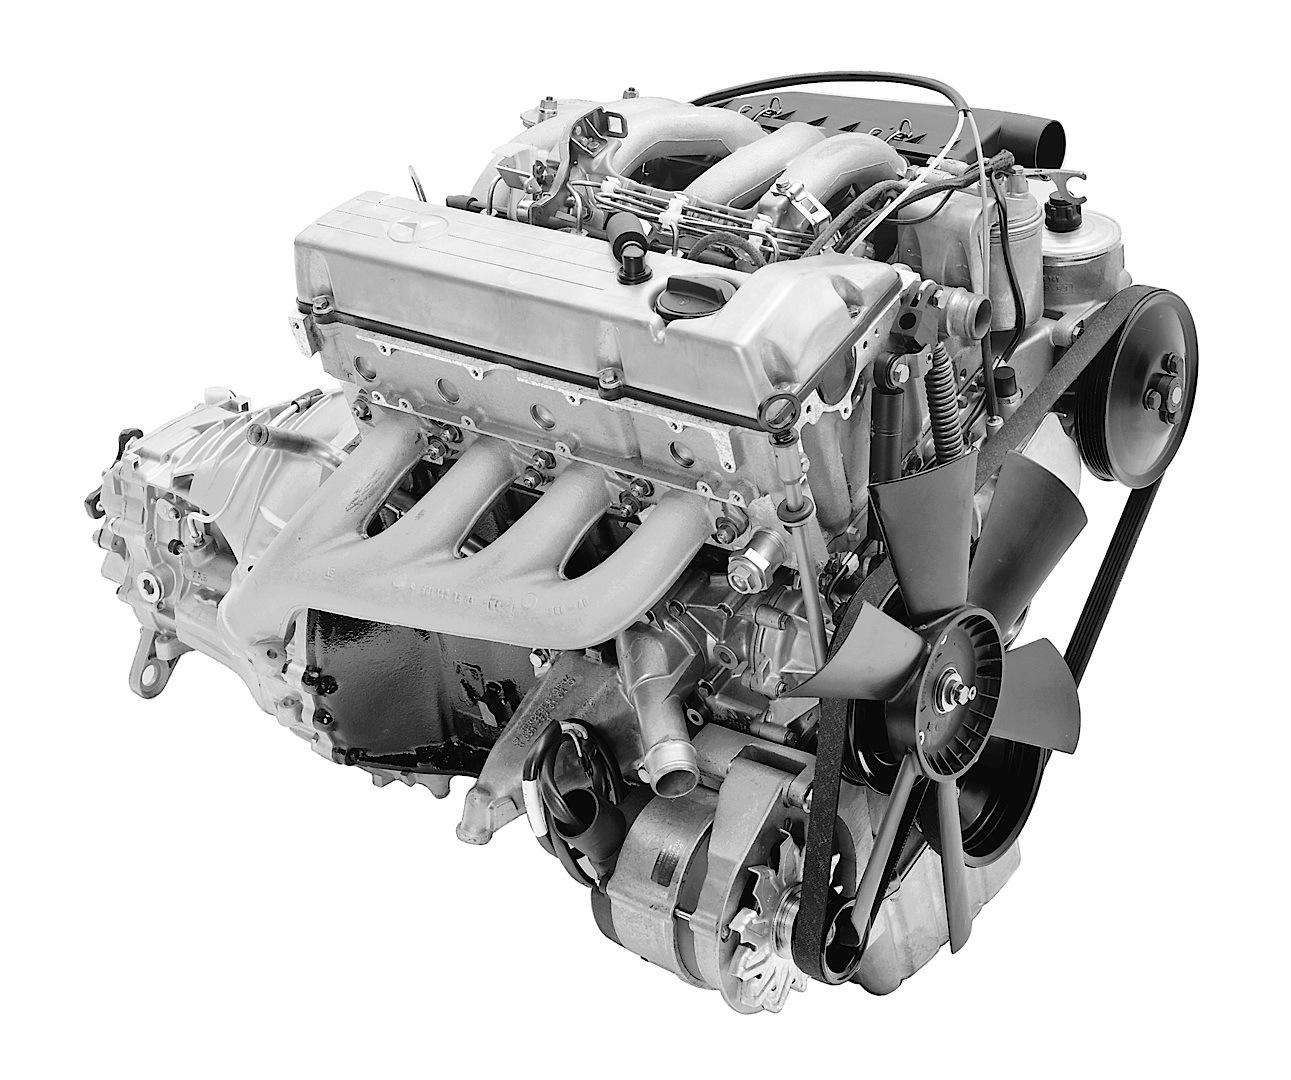 Mercedes Benz C Class Powertrain Milestones Autoevolution M117 Engine